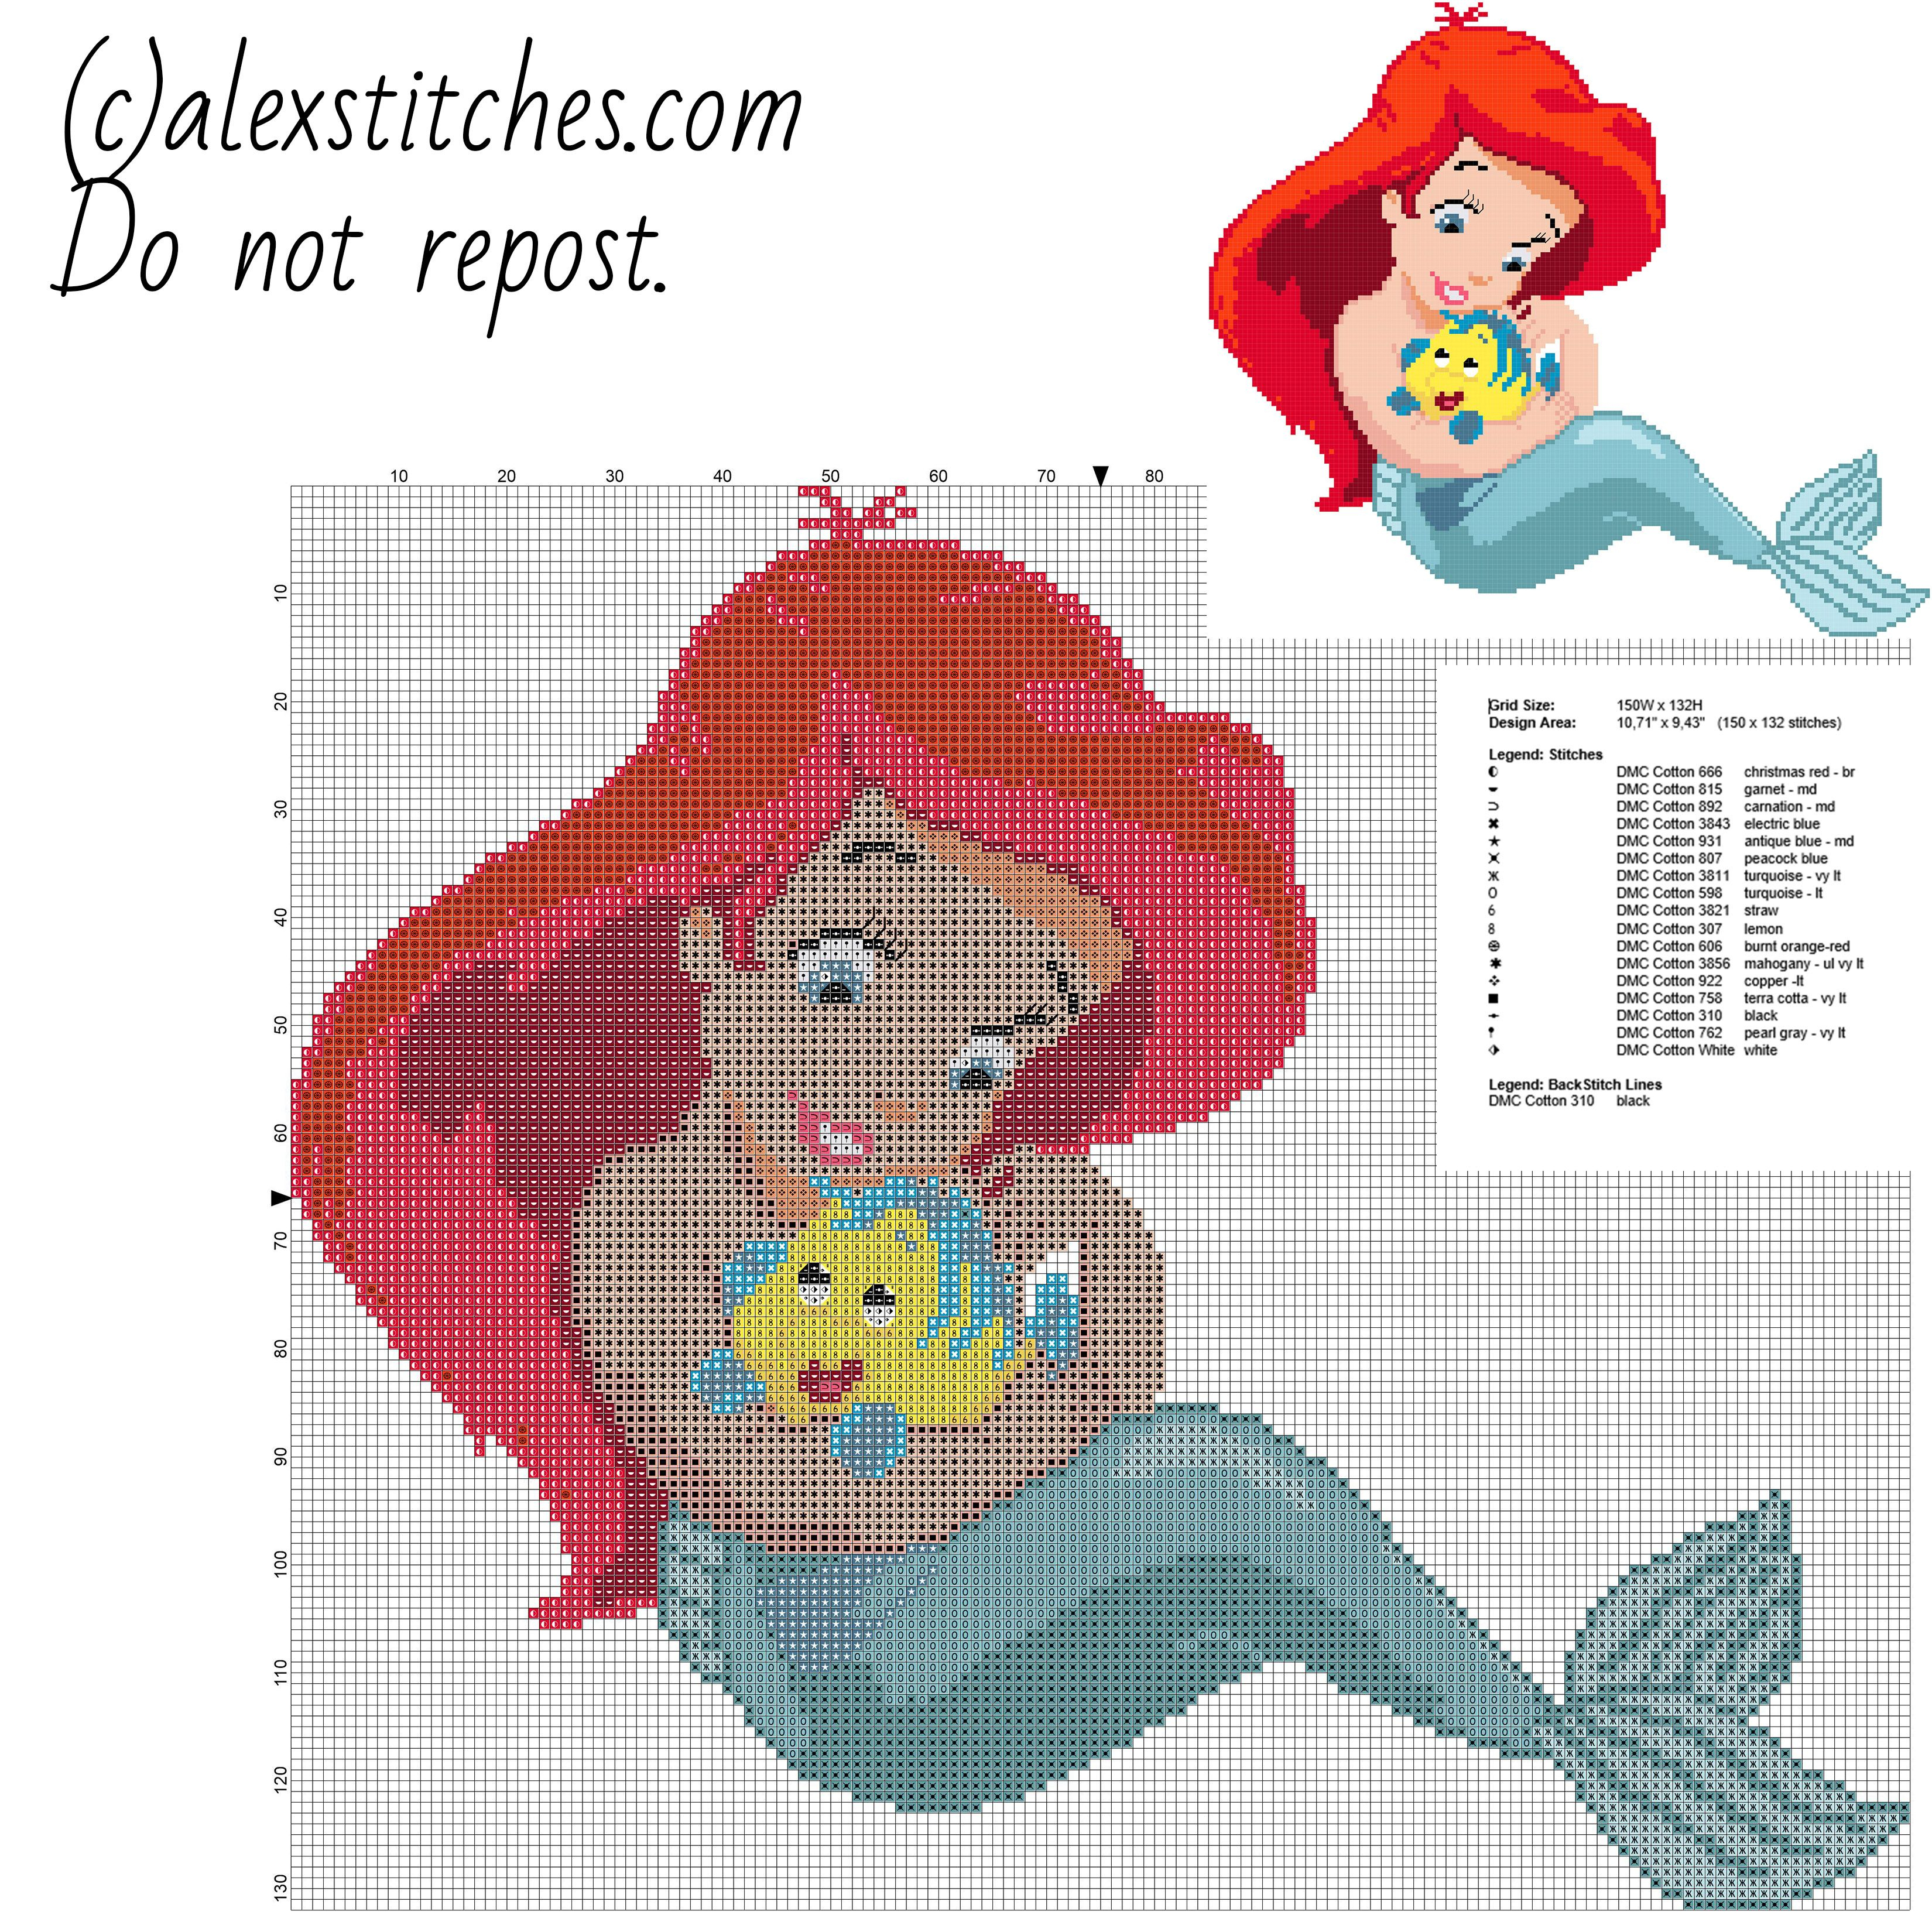 Disney Baby Princess Ariel Free Cross Stitch Pattern Download In - Baby Cross Stitch Patterns Free Printable